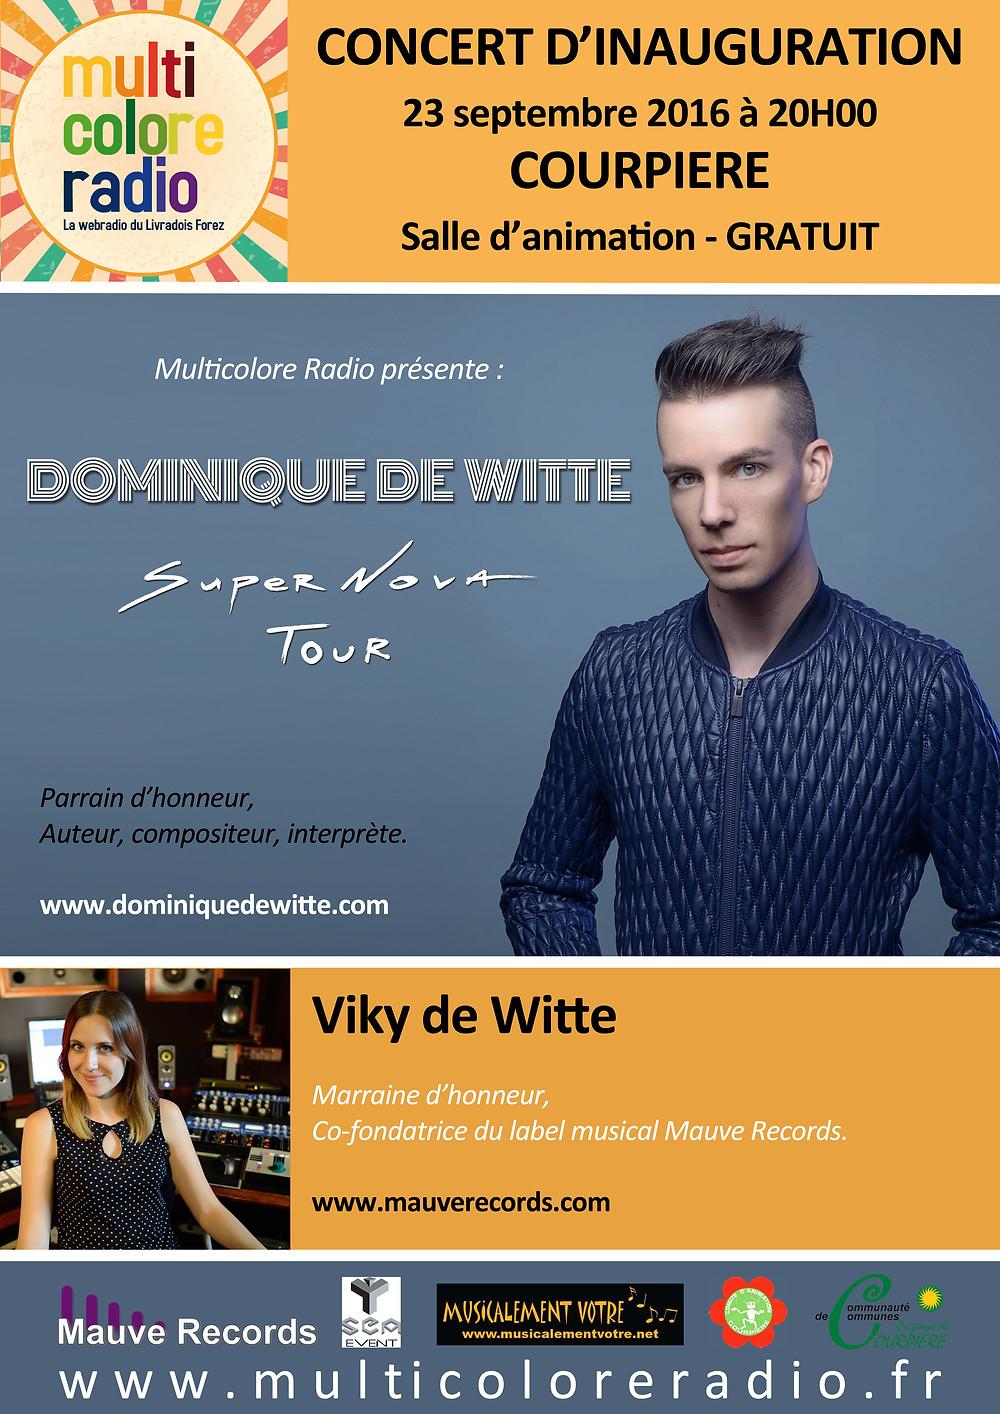 Dominique de Witte - CONCERT - Multicolore Radio - Supernova Tour 2016